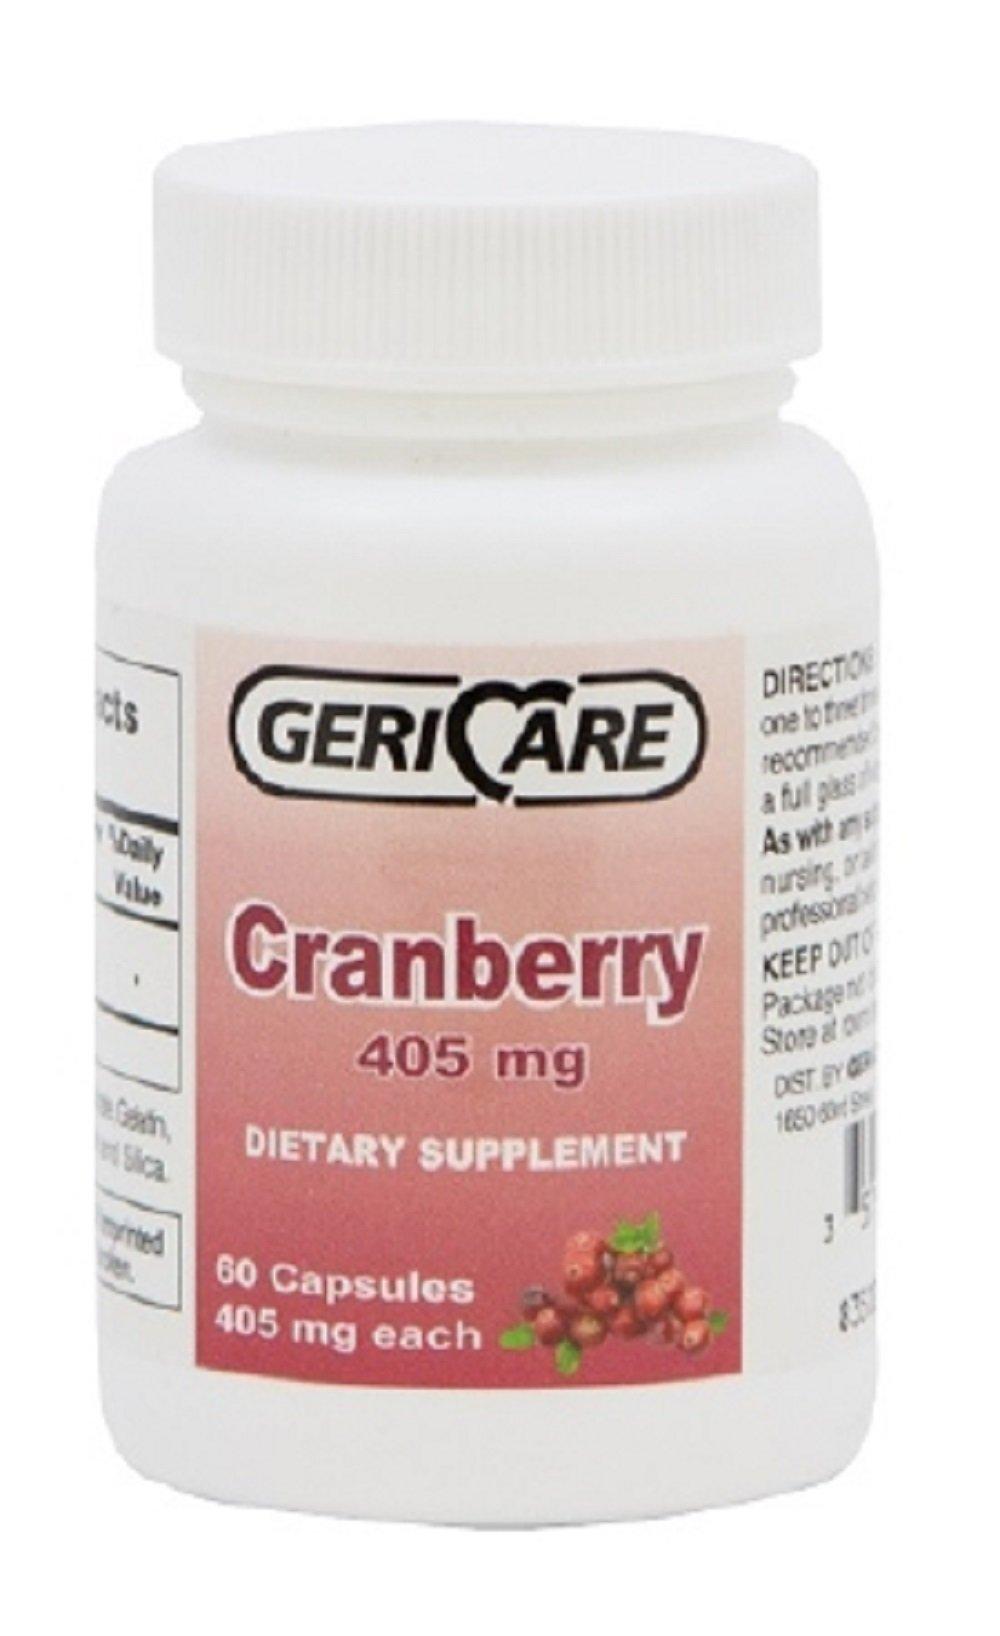 McKesson Brand - Cranberry Supplement - 405 mg Strength - Caplet - 60 per Bottle - 12/Case